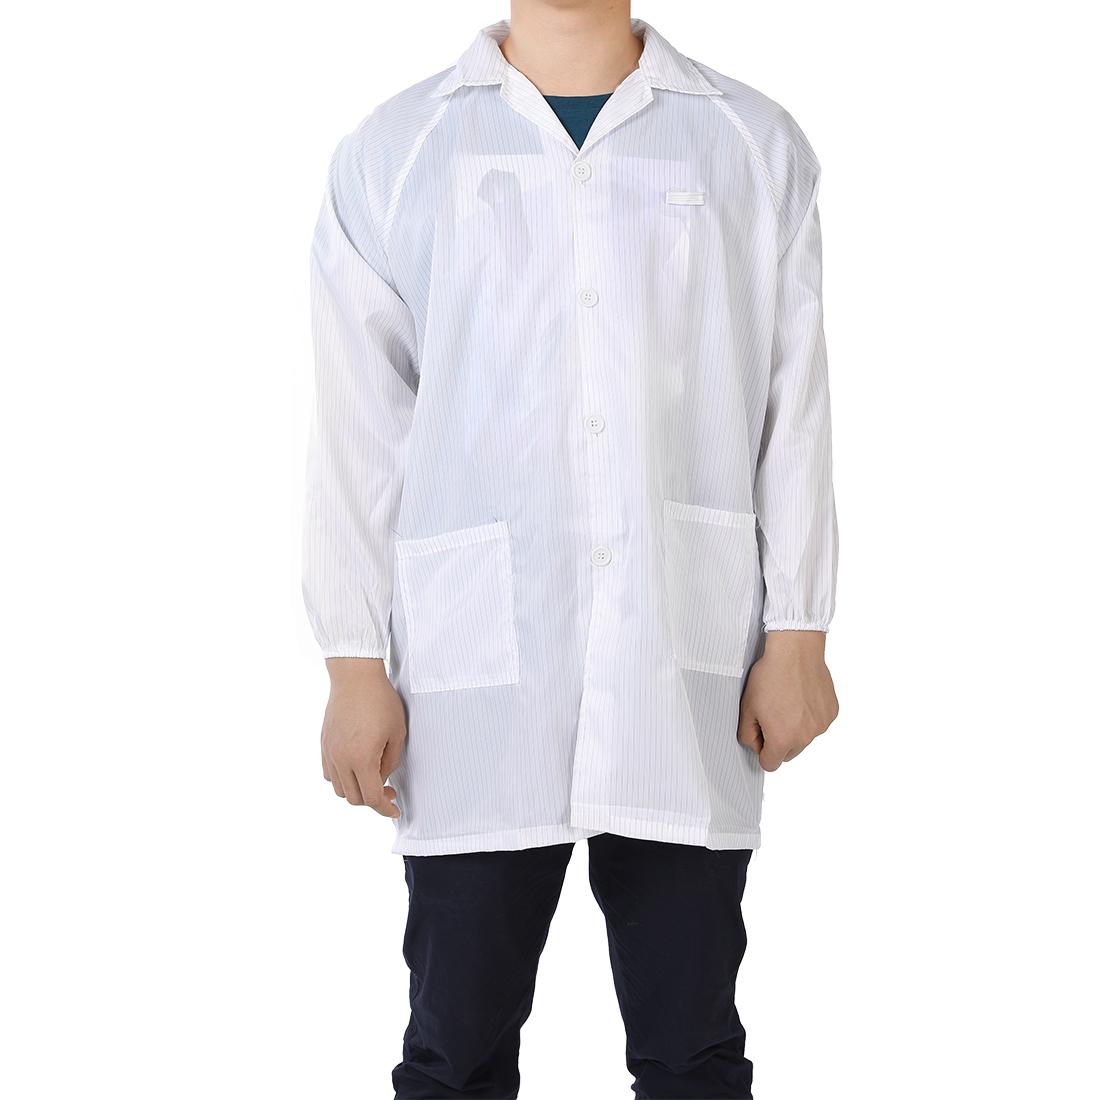 Anti Static Overalls Unisex ESD Lab Coat Button Up L White